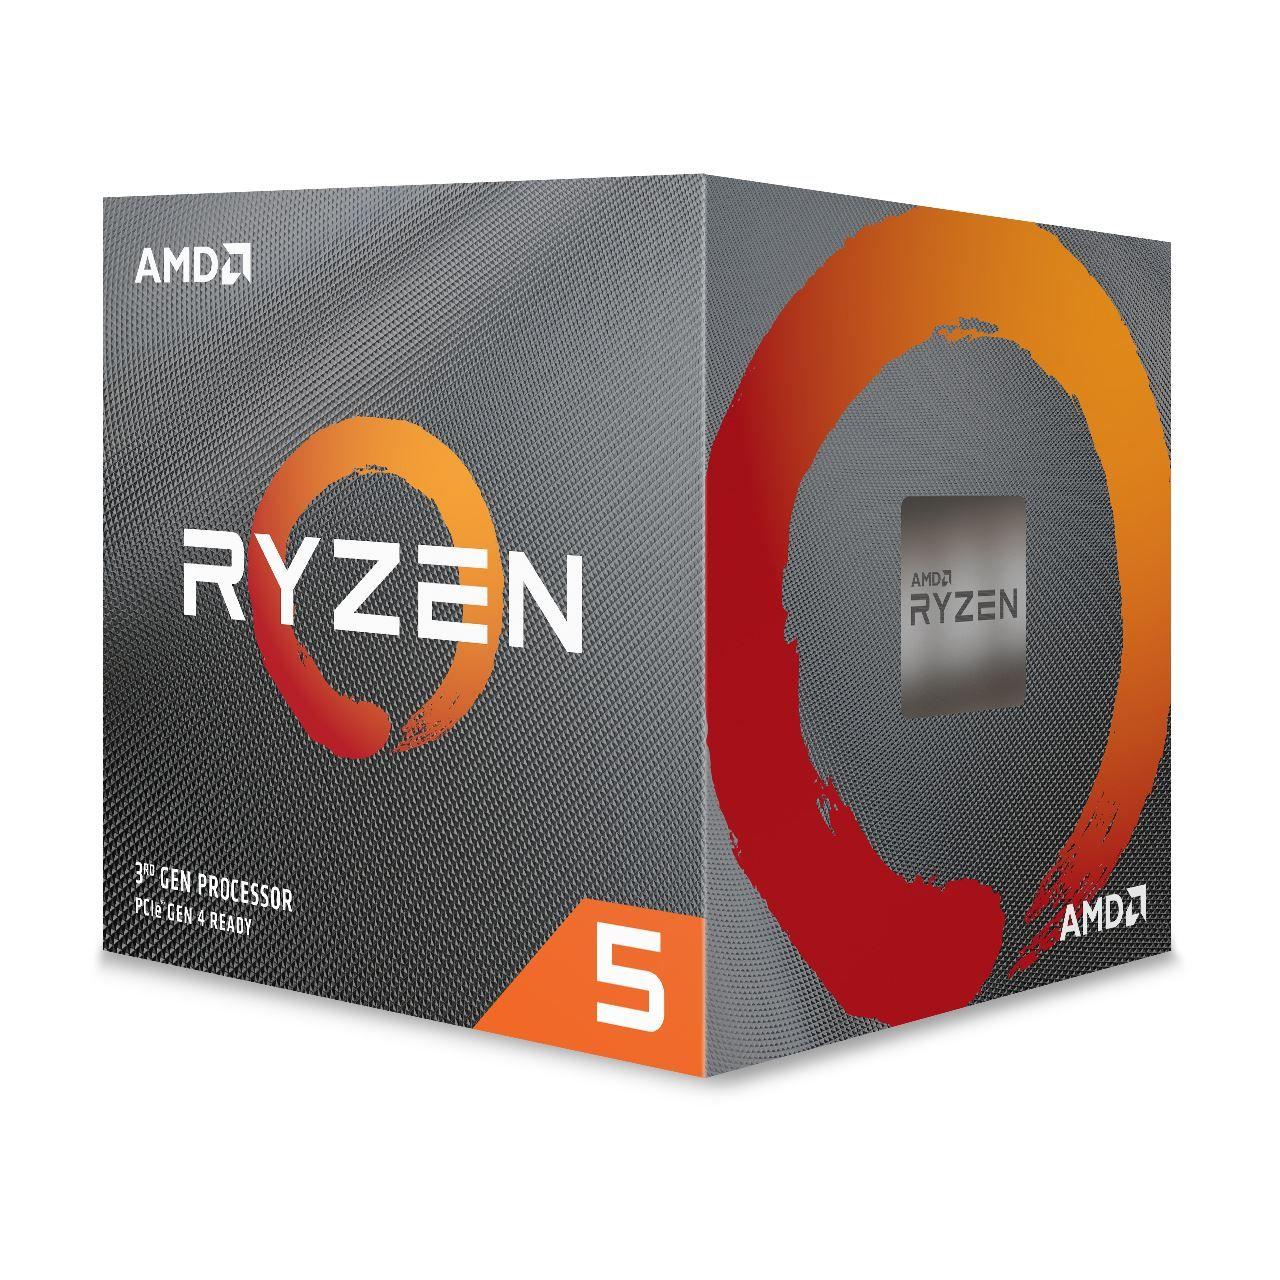 AMD Ryzen 3500X Tray Mindfactory Midnight Shopping